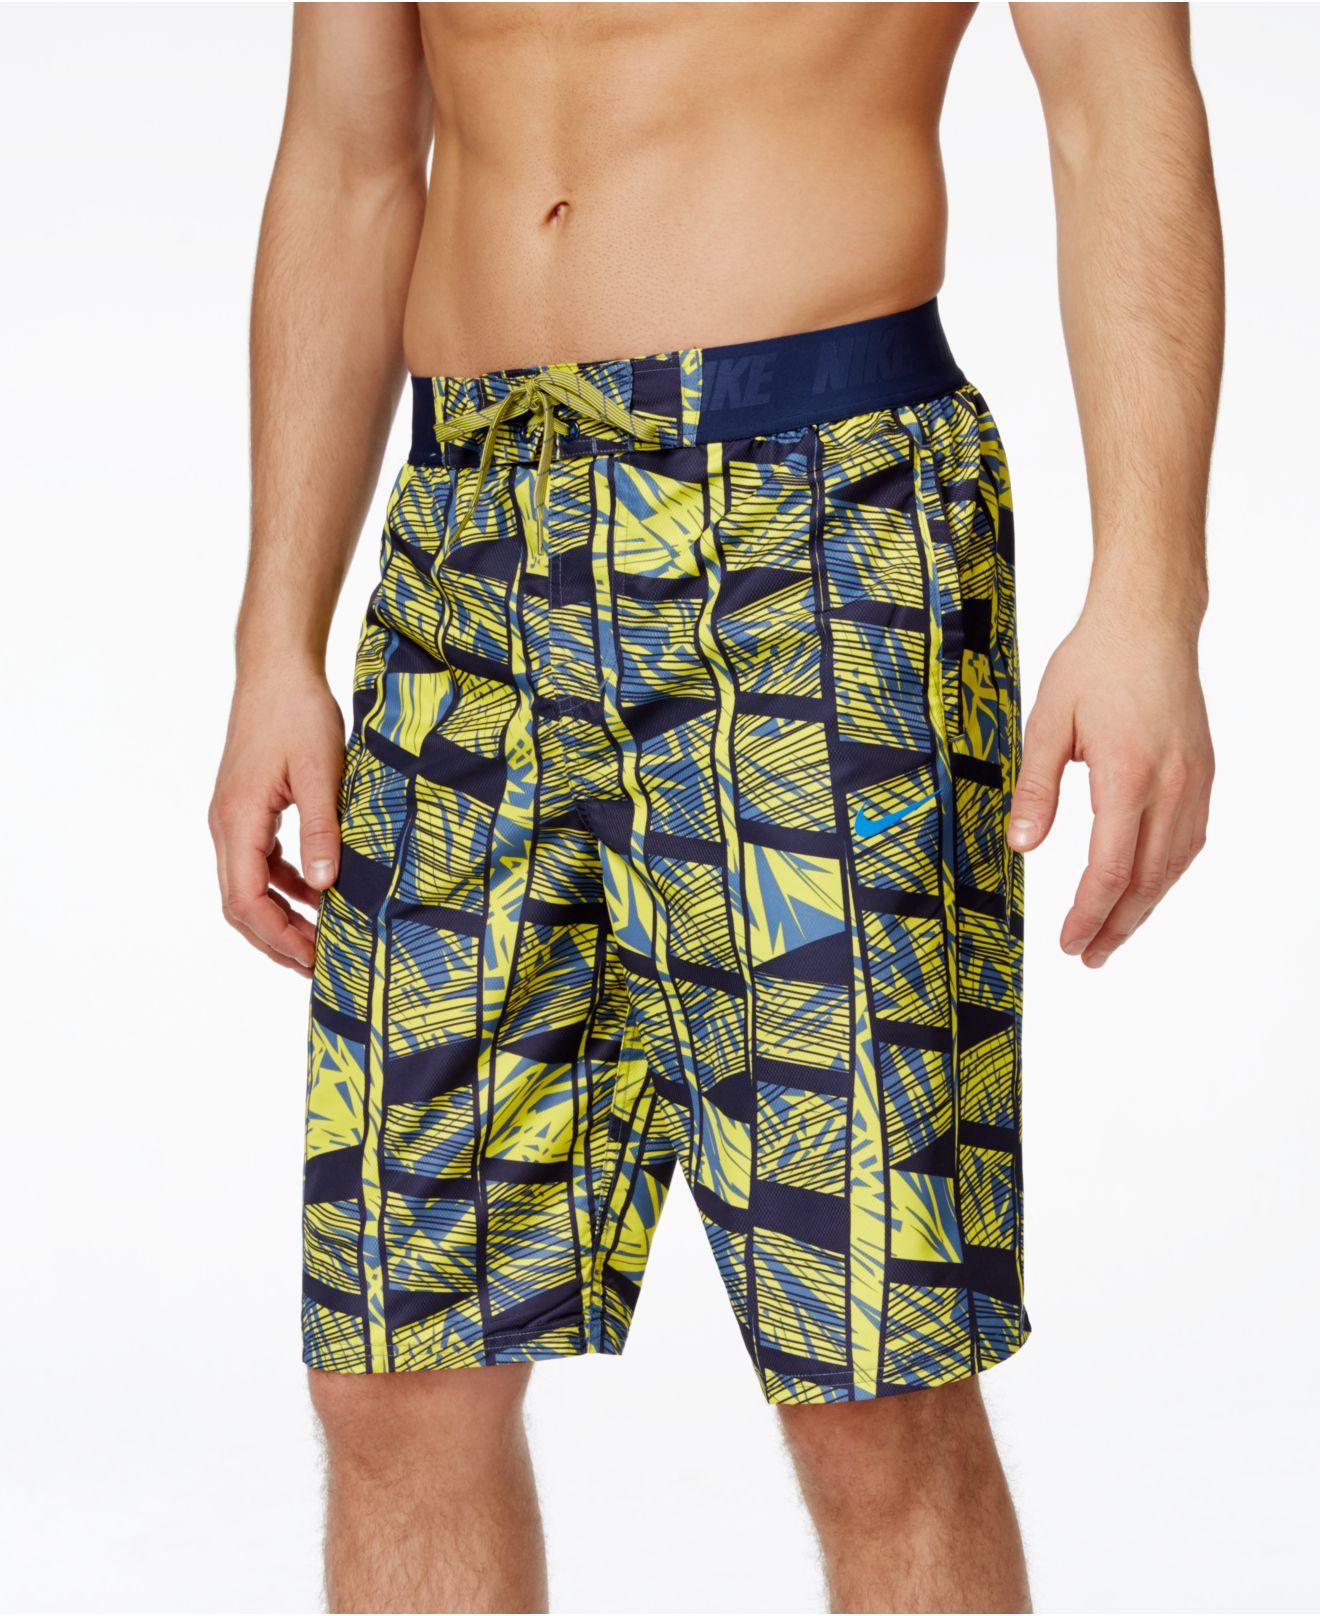 "Lyst - Nike Men's Atlas 11"" Volley Shorts for Men"